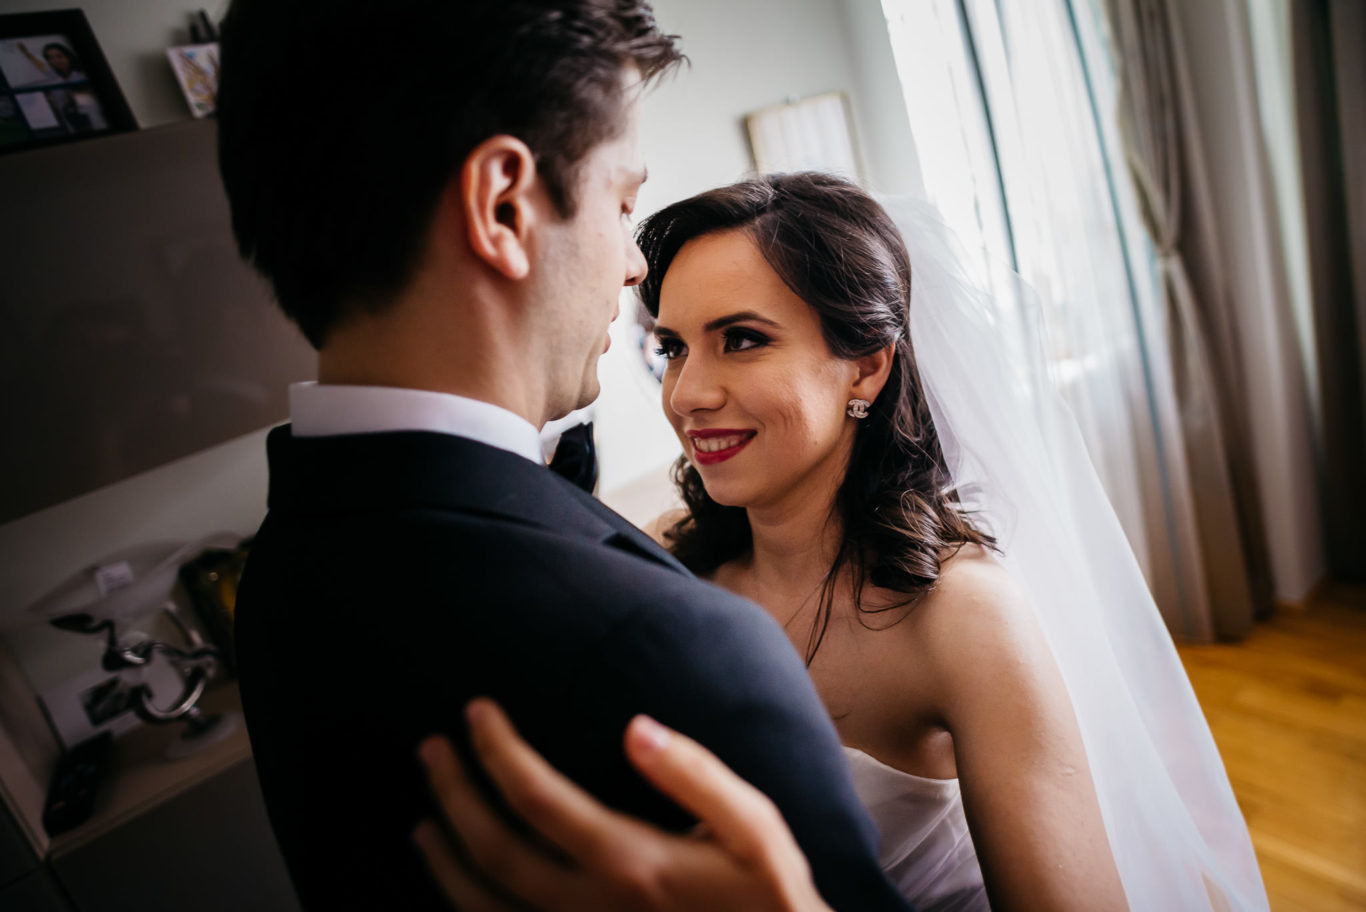 0342-Fotografie-nunta-Simona-Valentin-fotograf-Ciprian-Dumitrescu-DSC_1319